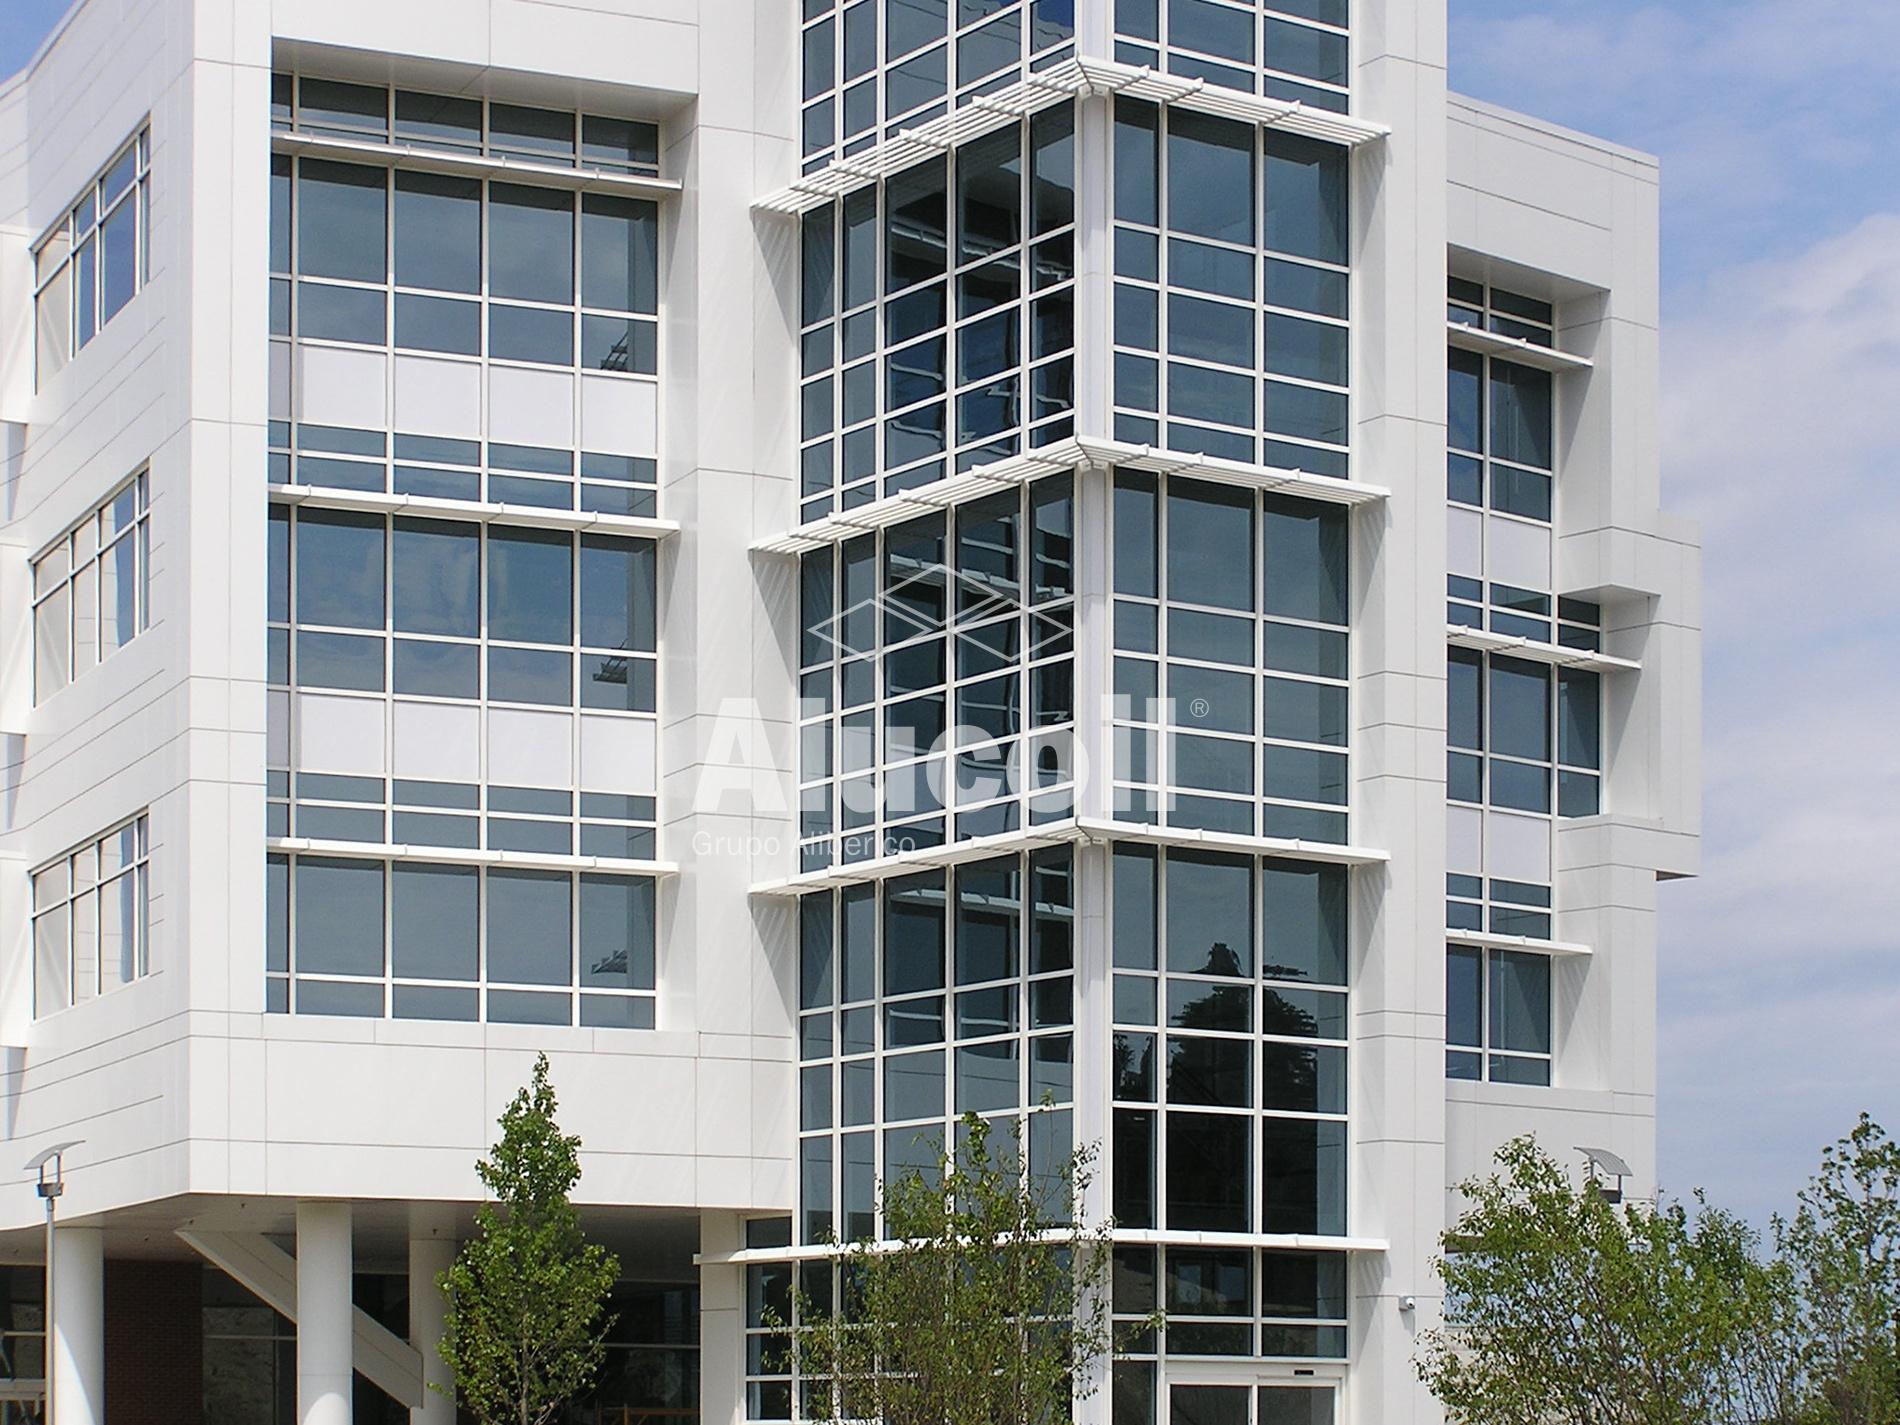 Ocean County College Gateway Building